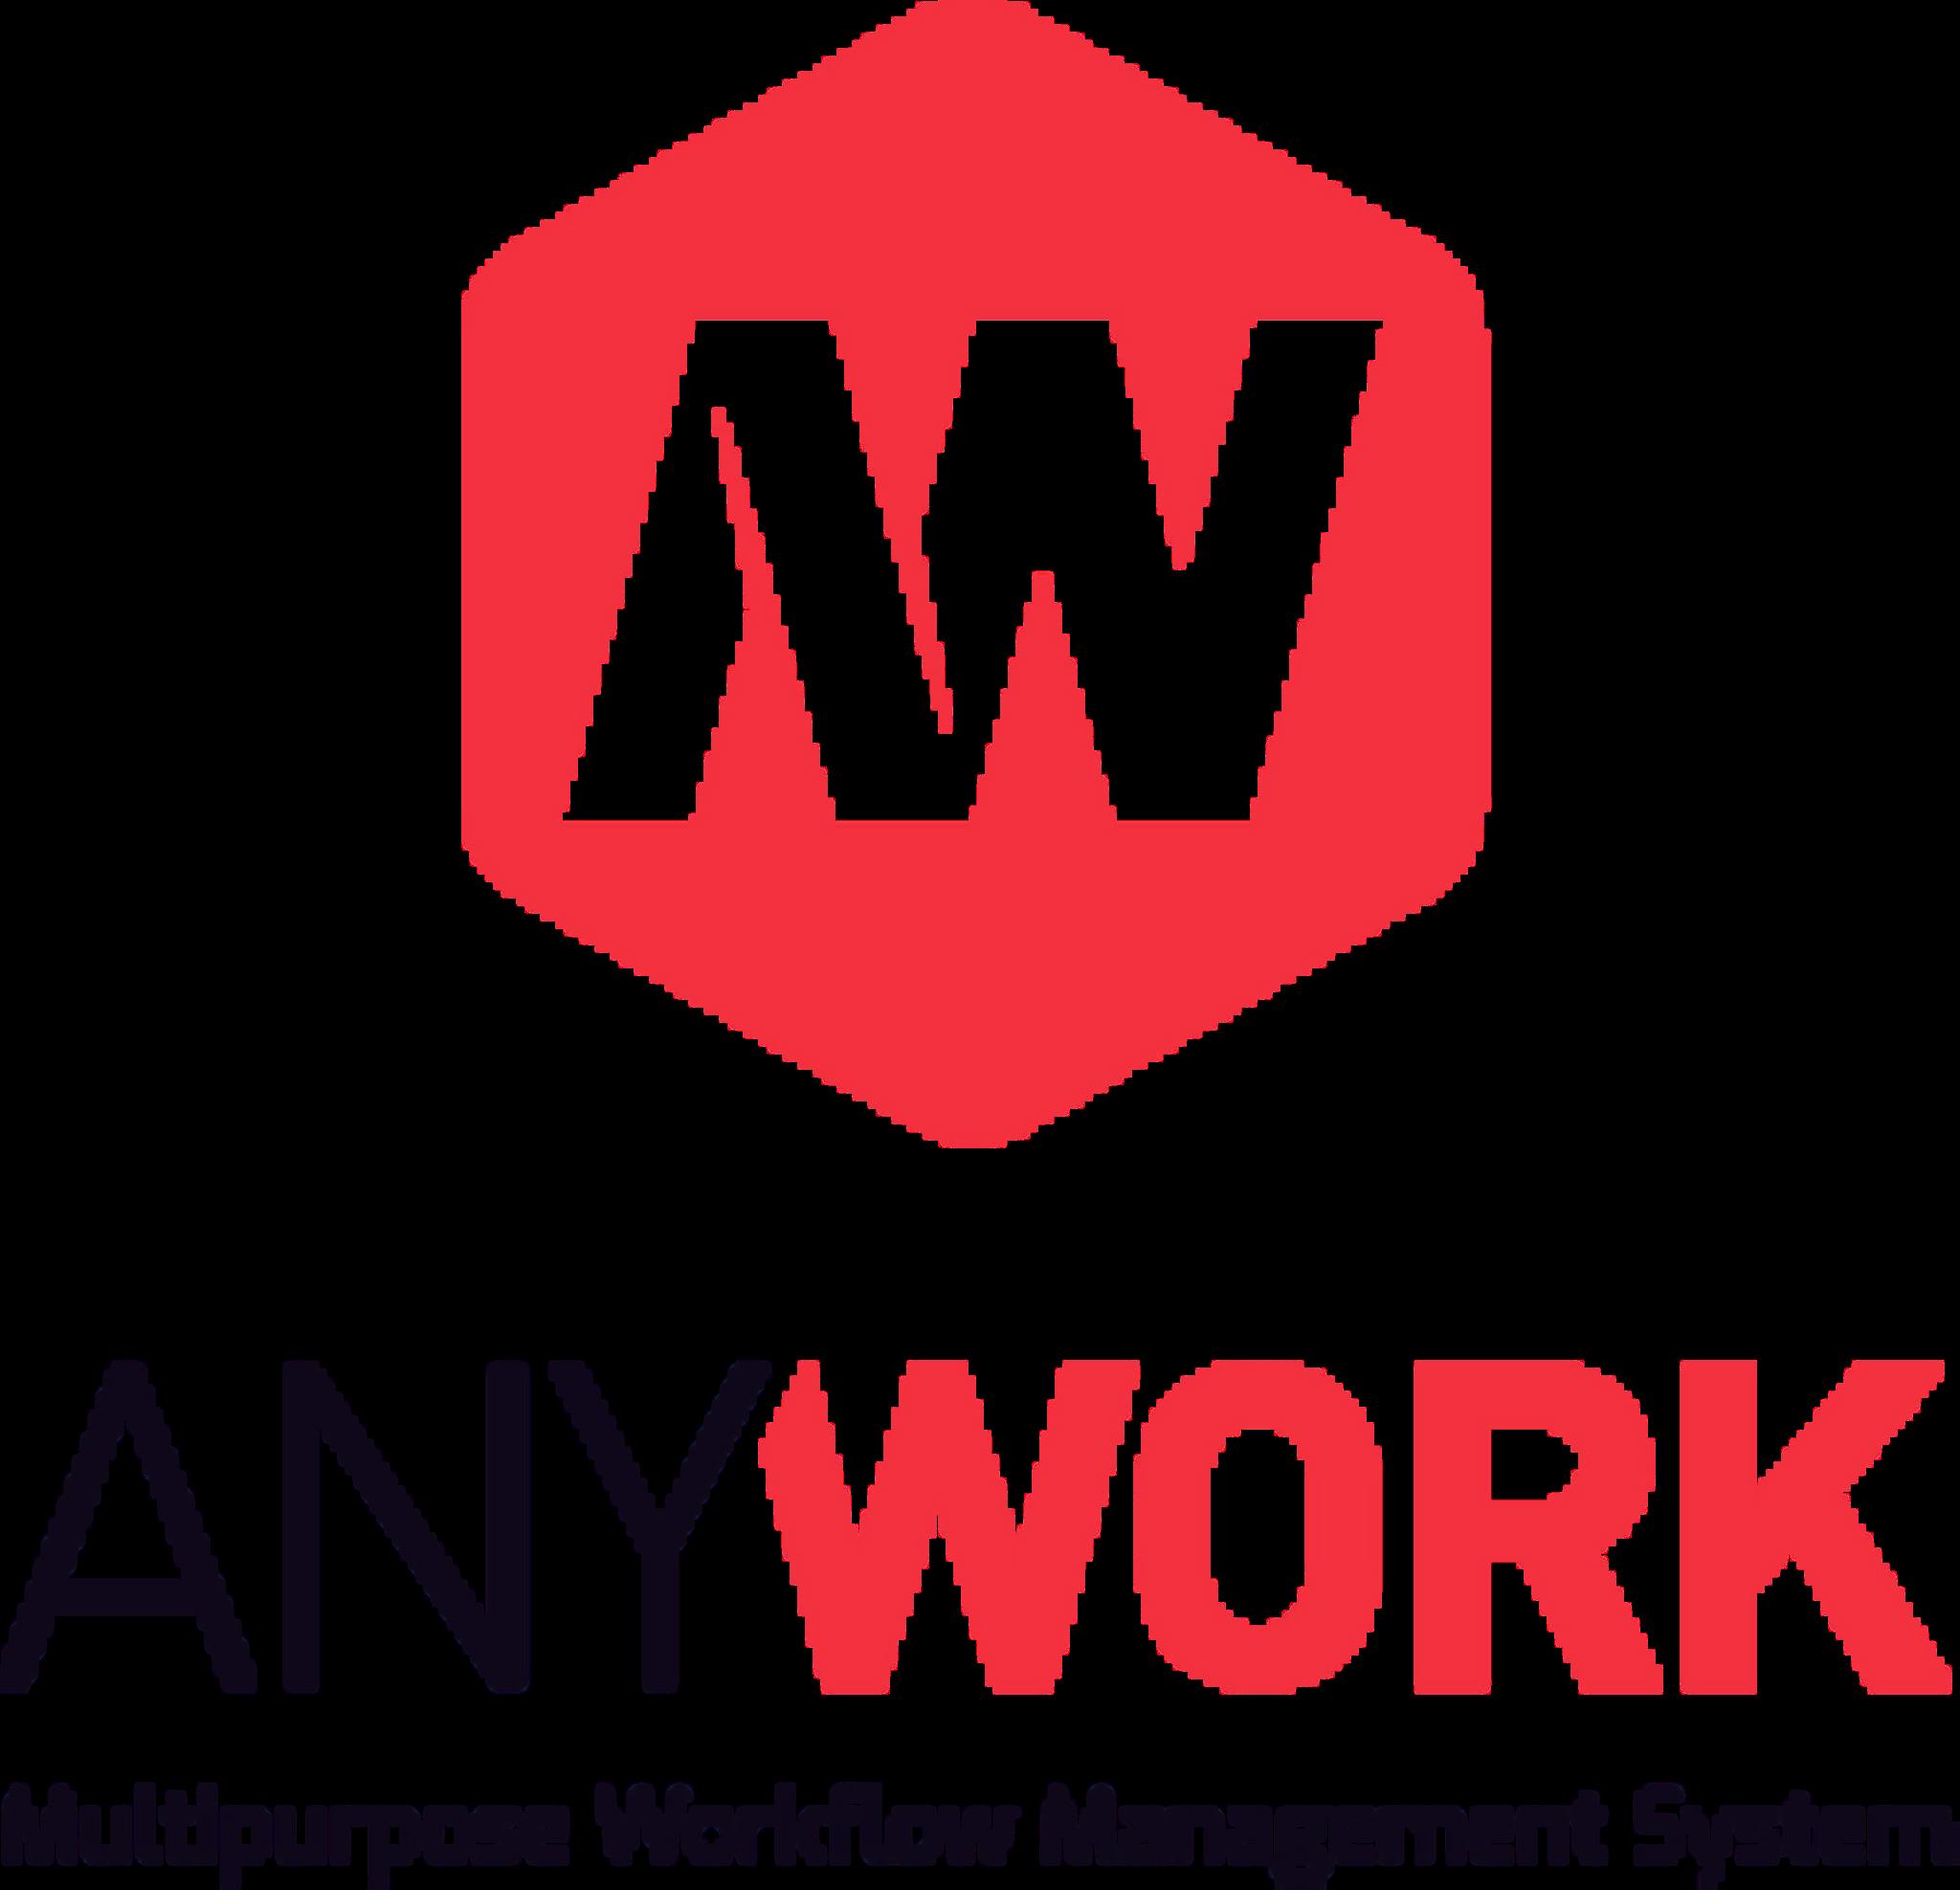 AnyWork Communications GmbH